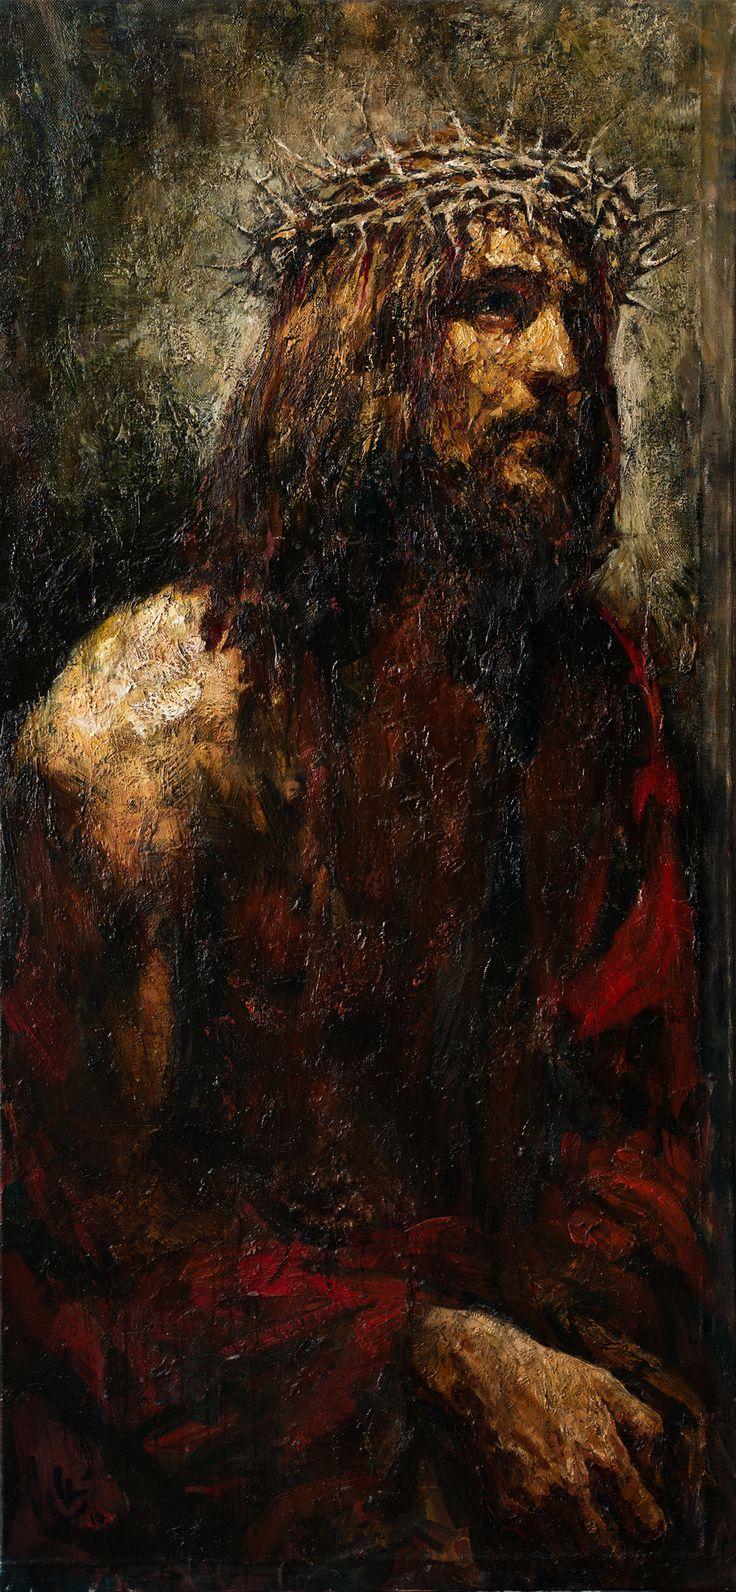 """Ecce homo"", 162x75 cm, oil on canvas,2013. Anatoly Shumkin"